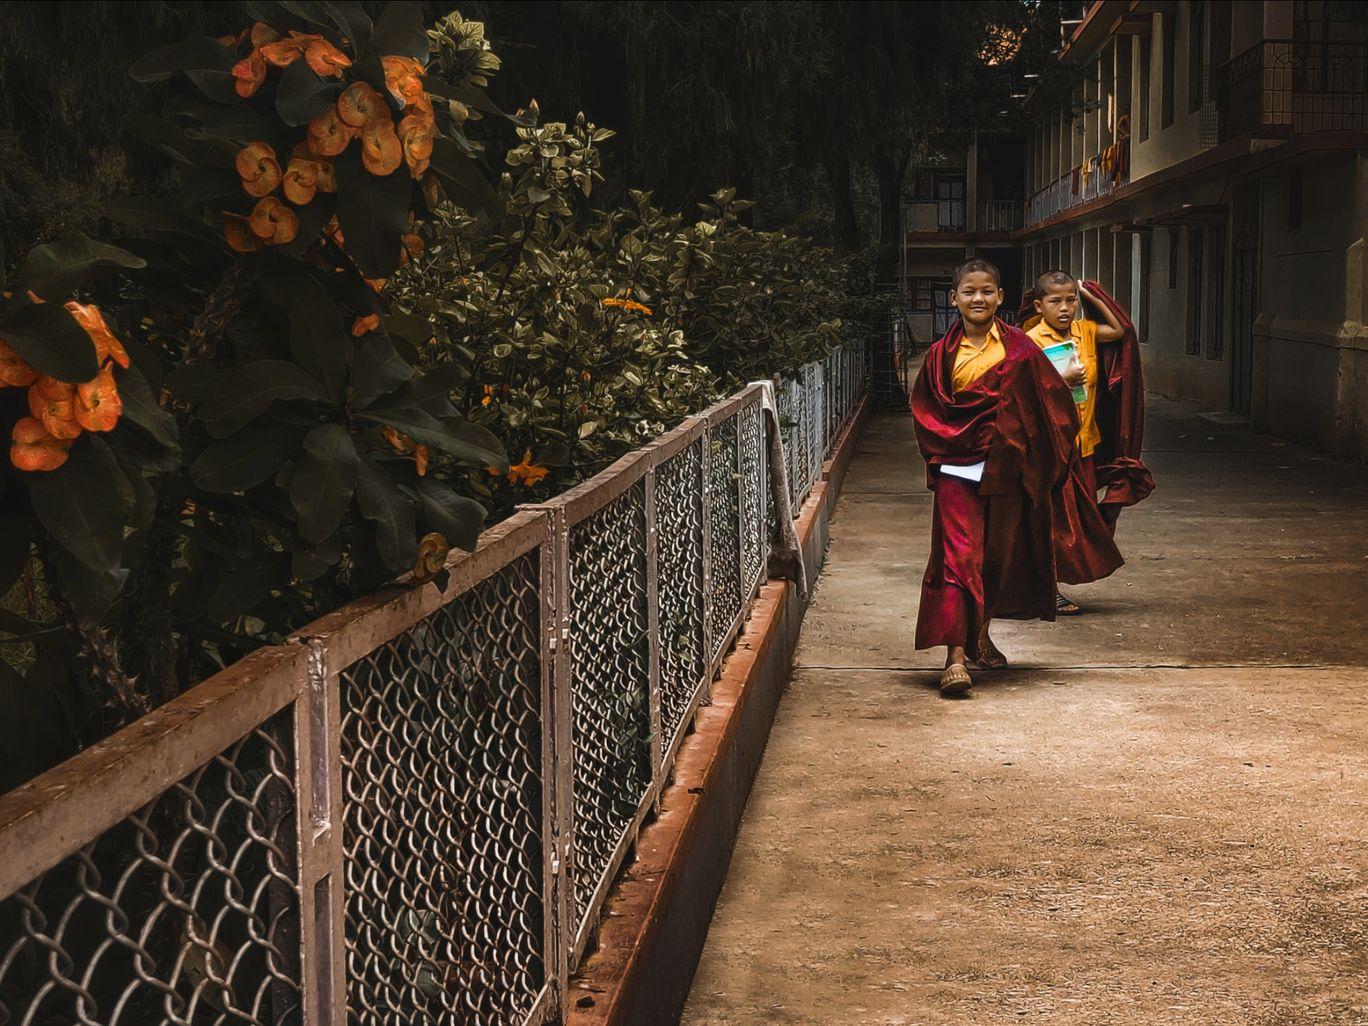 Photo of Namdroling Monastery Golden Temple By Swati Bhingare